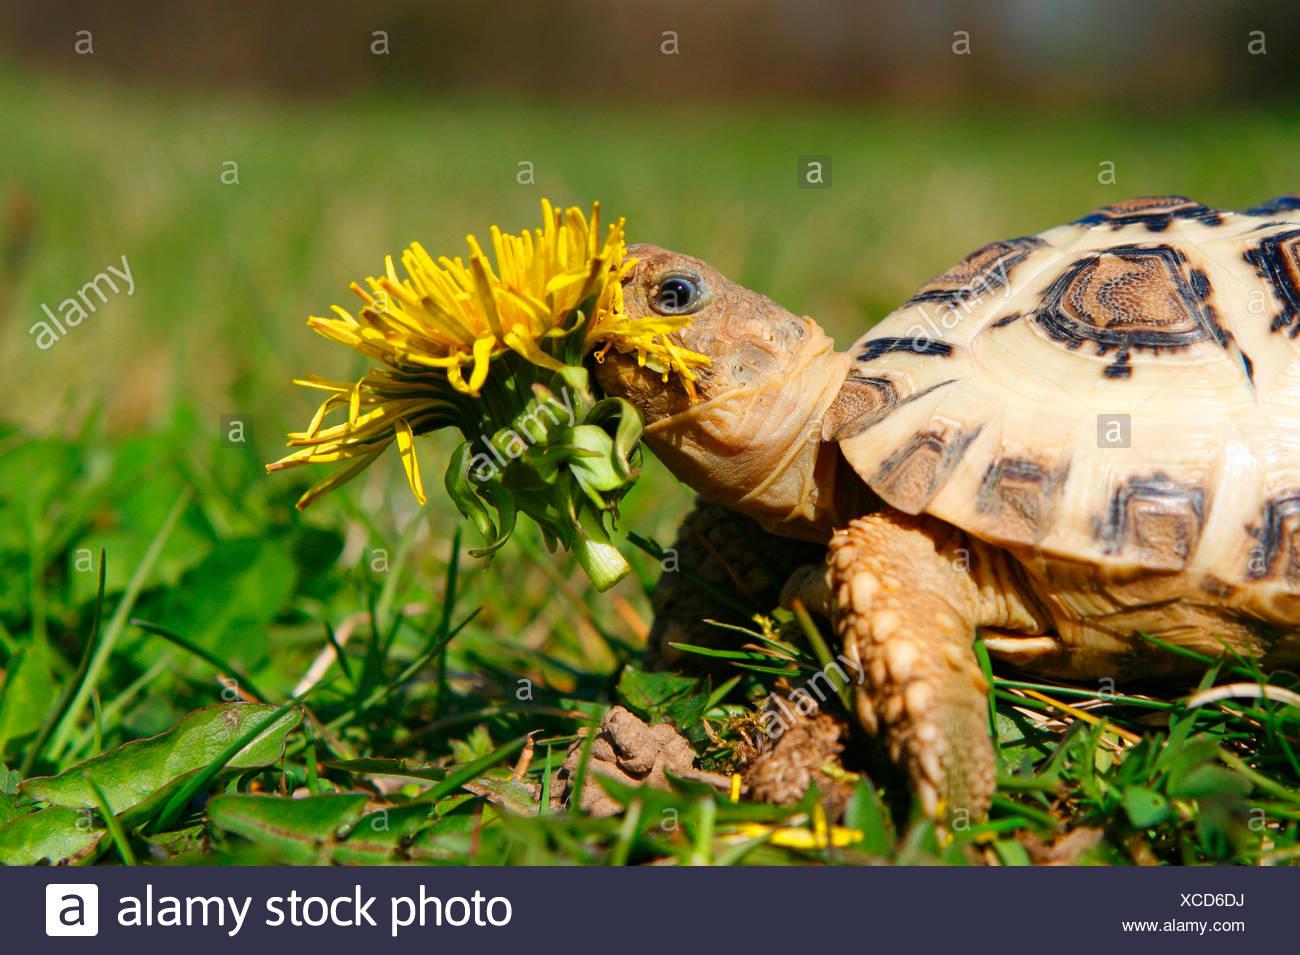 Leopard Tortoise - Stock Image